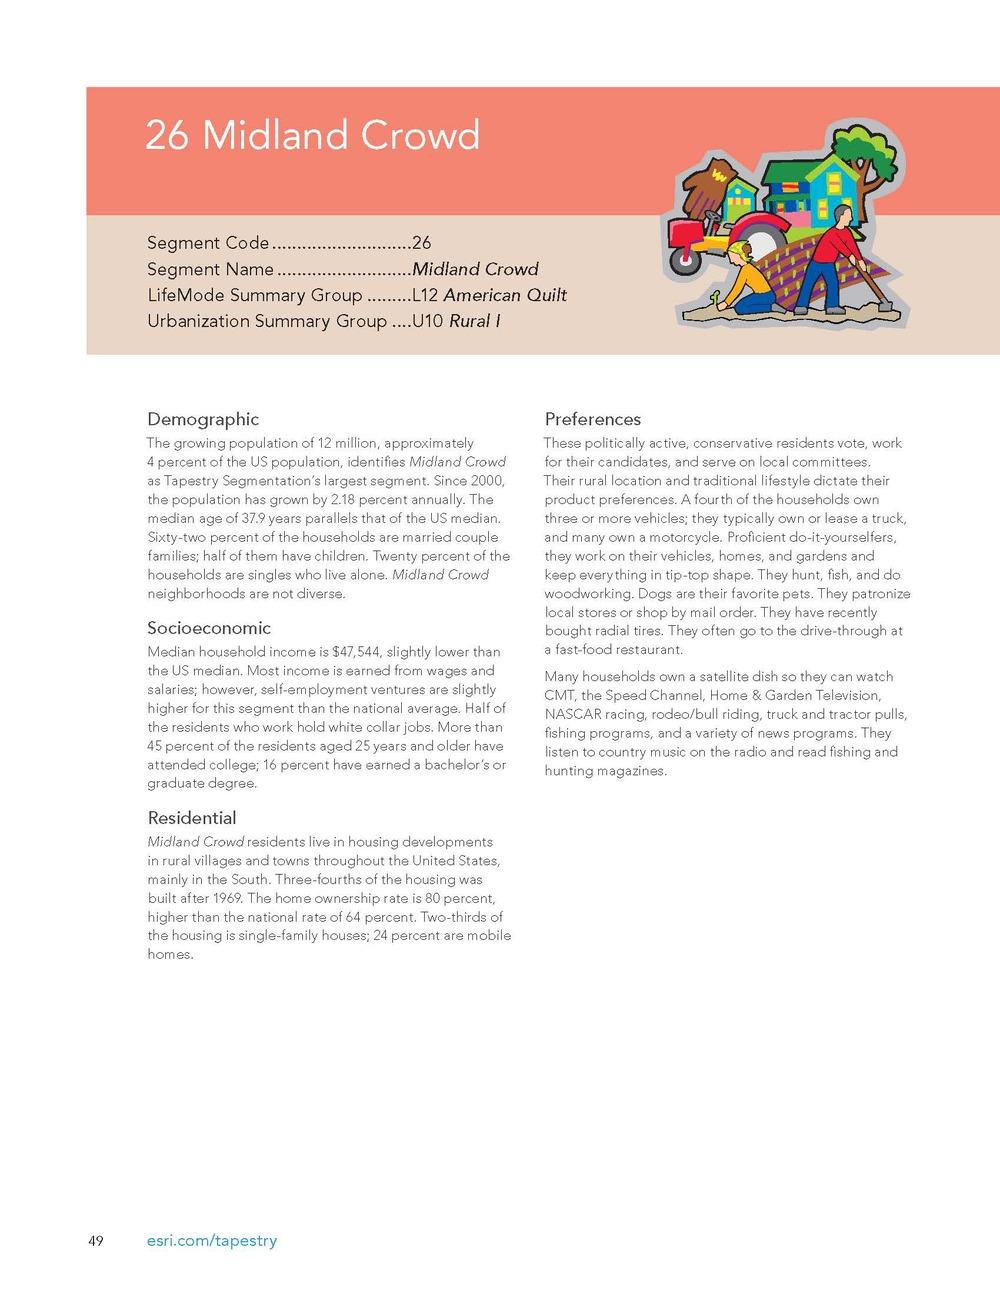 tapestry-segmentation_Page_52.jpg